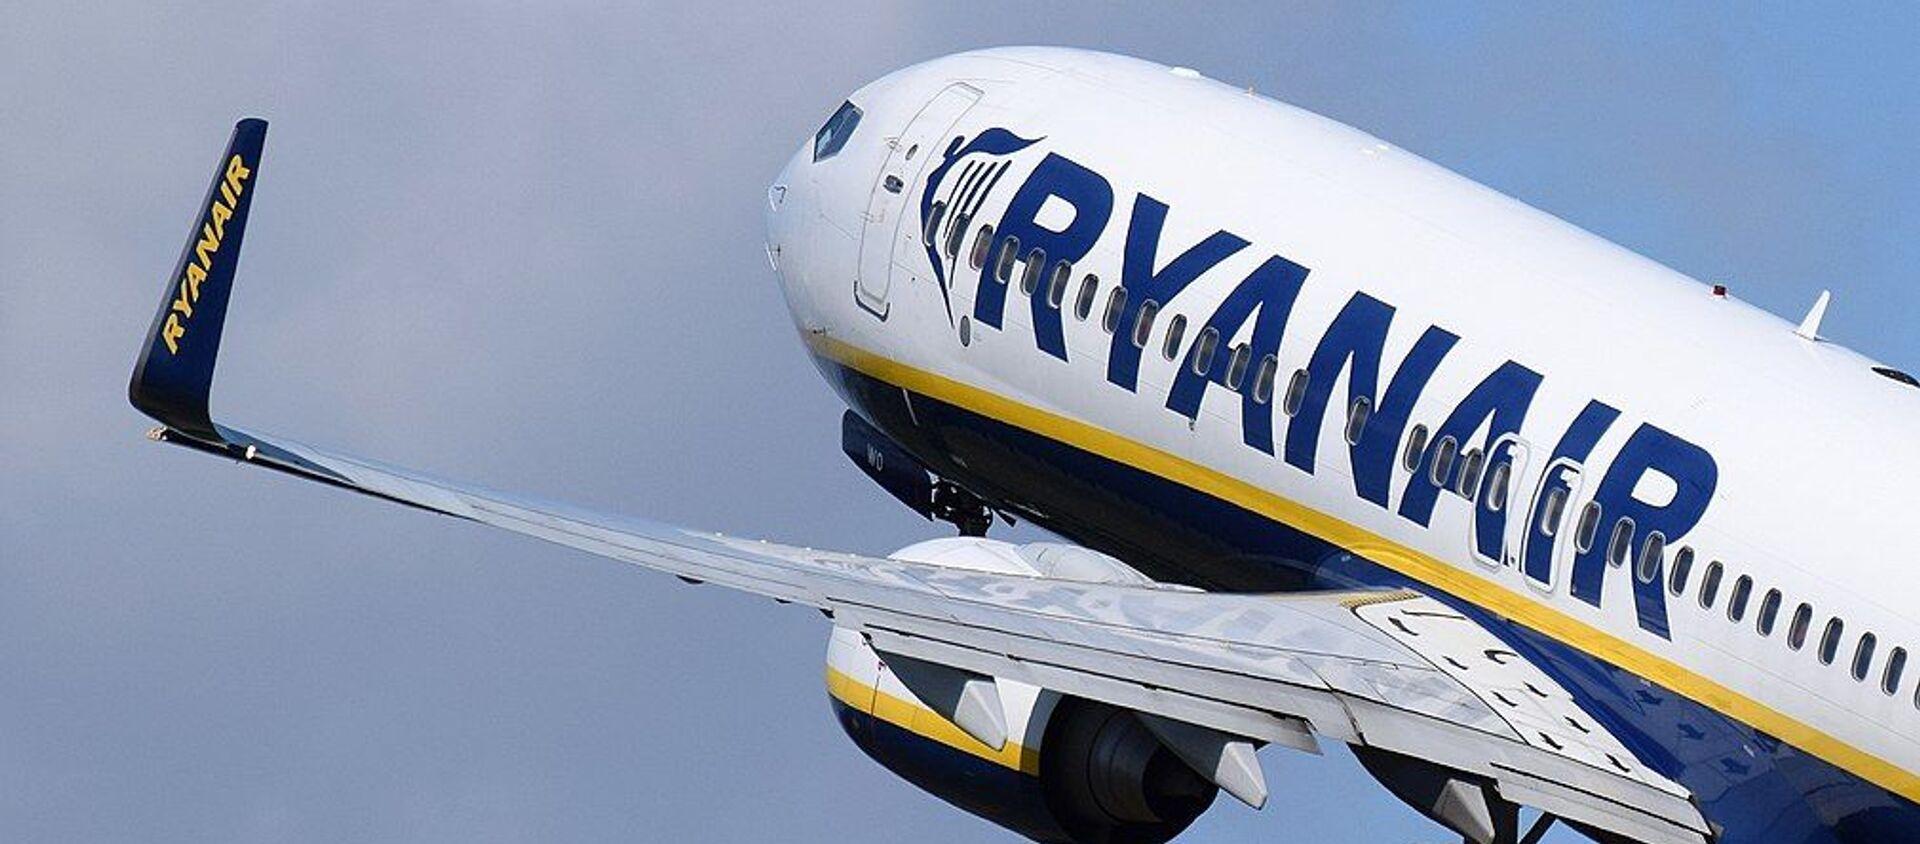 Boeing 737 Ryanair - Sputnik Polska, 1920, 24.05.2021